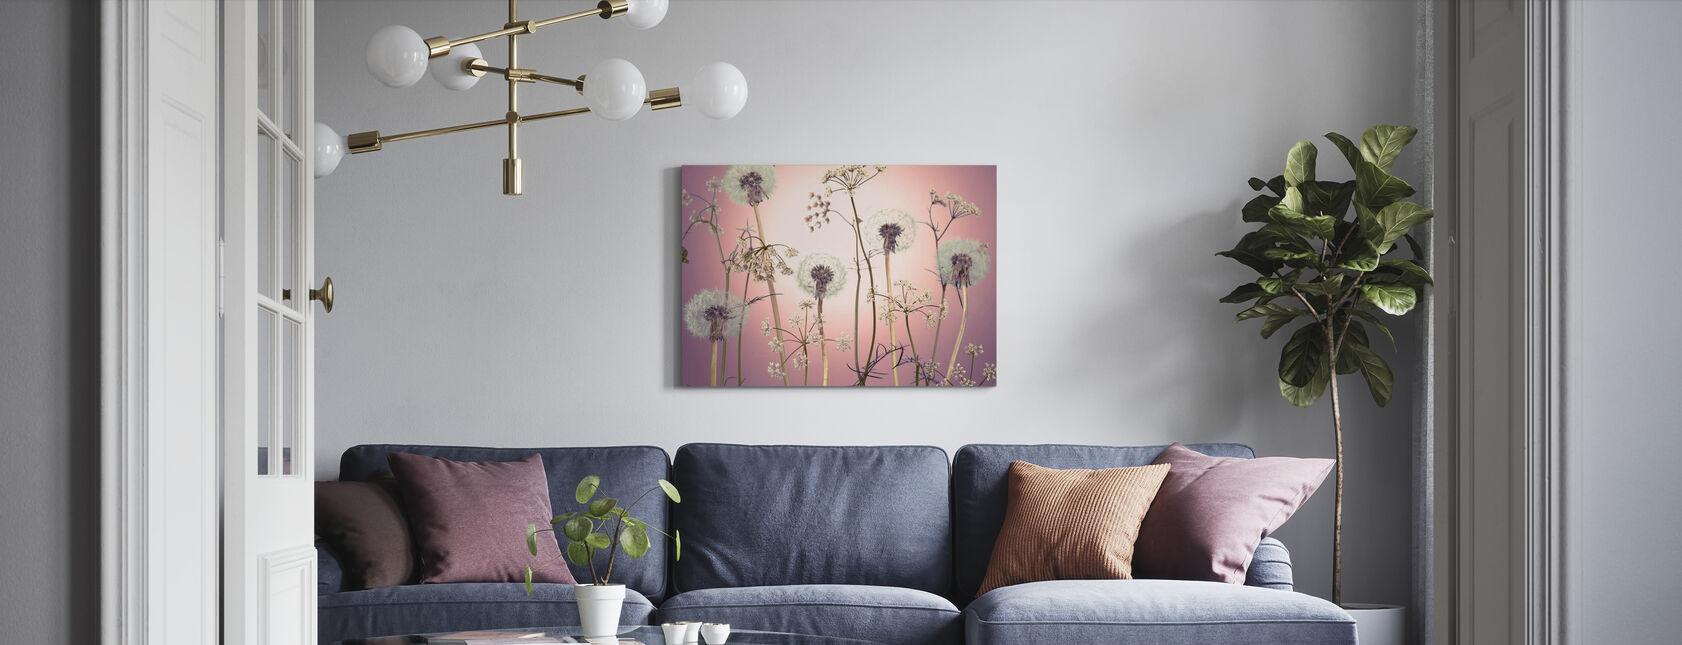 Meadow Flowers - Pink - Canvas print - Living Room